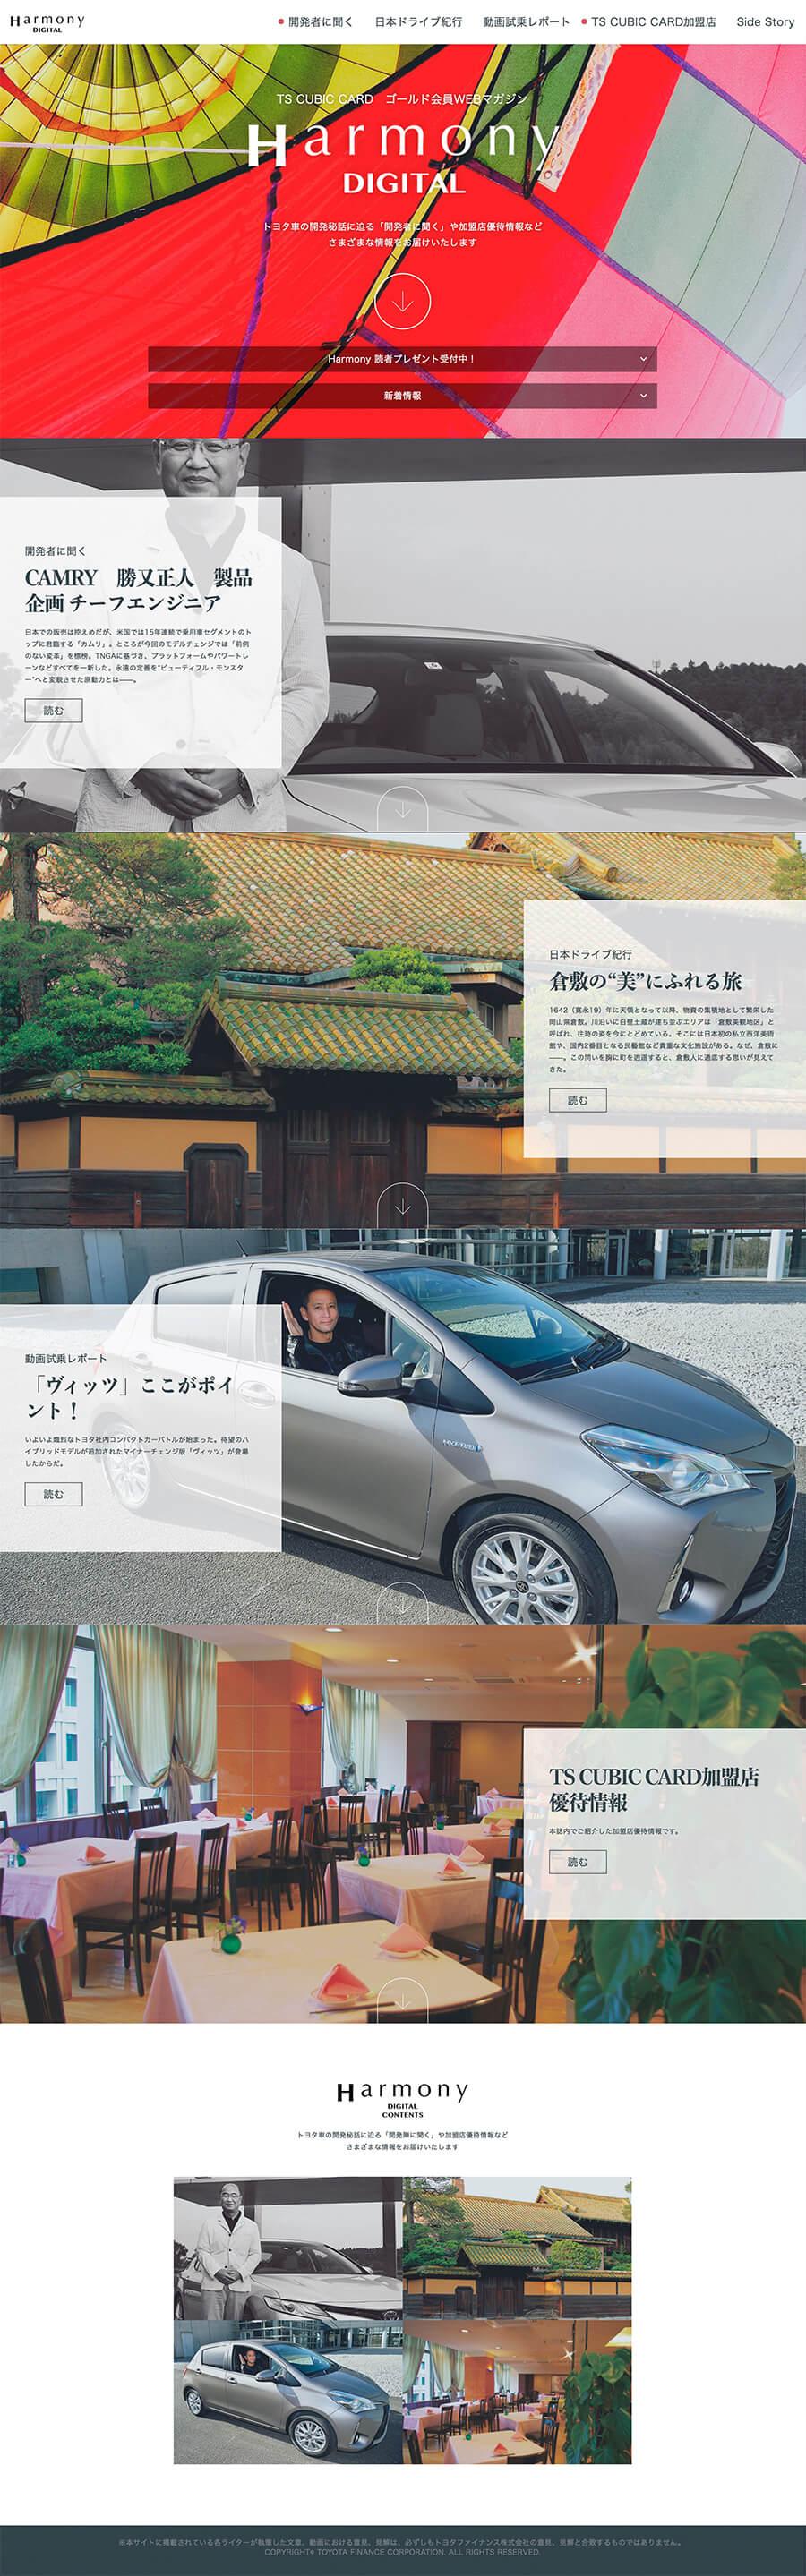 TS CUBIC CARDゴールド会員限定WEBマガジン ハーモニーデジタル